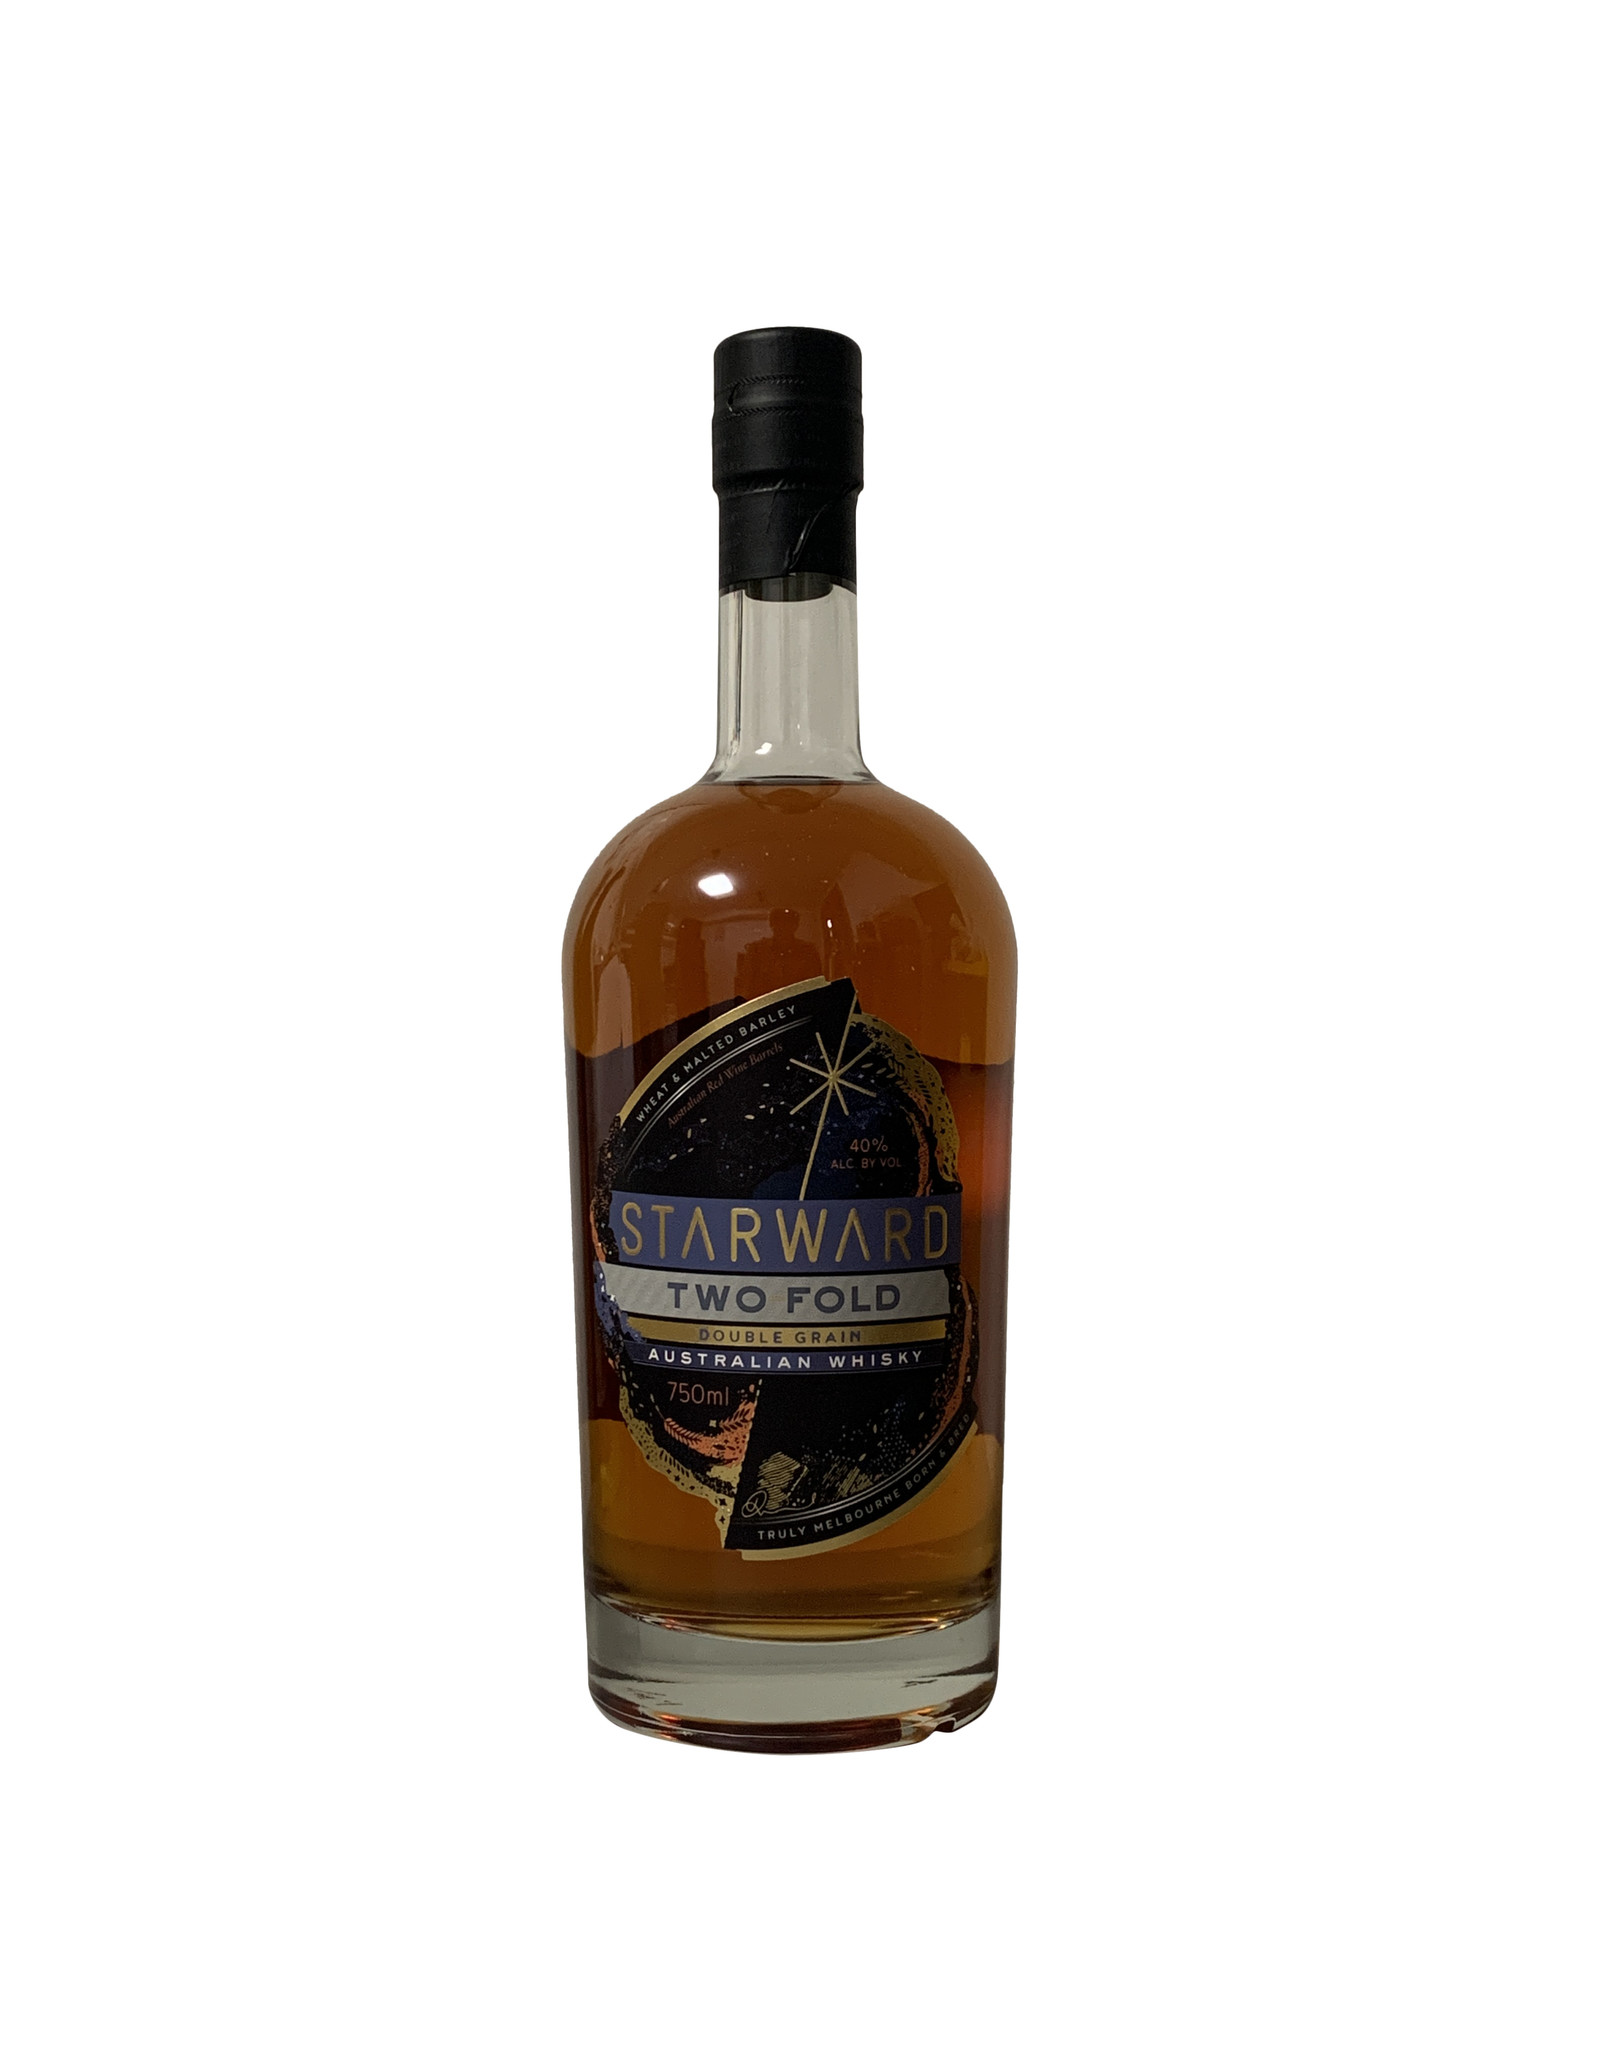 Starward Starward Two Fold Whisky, Australia (750mL)